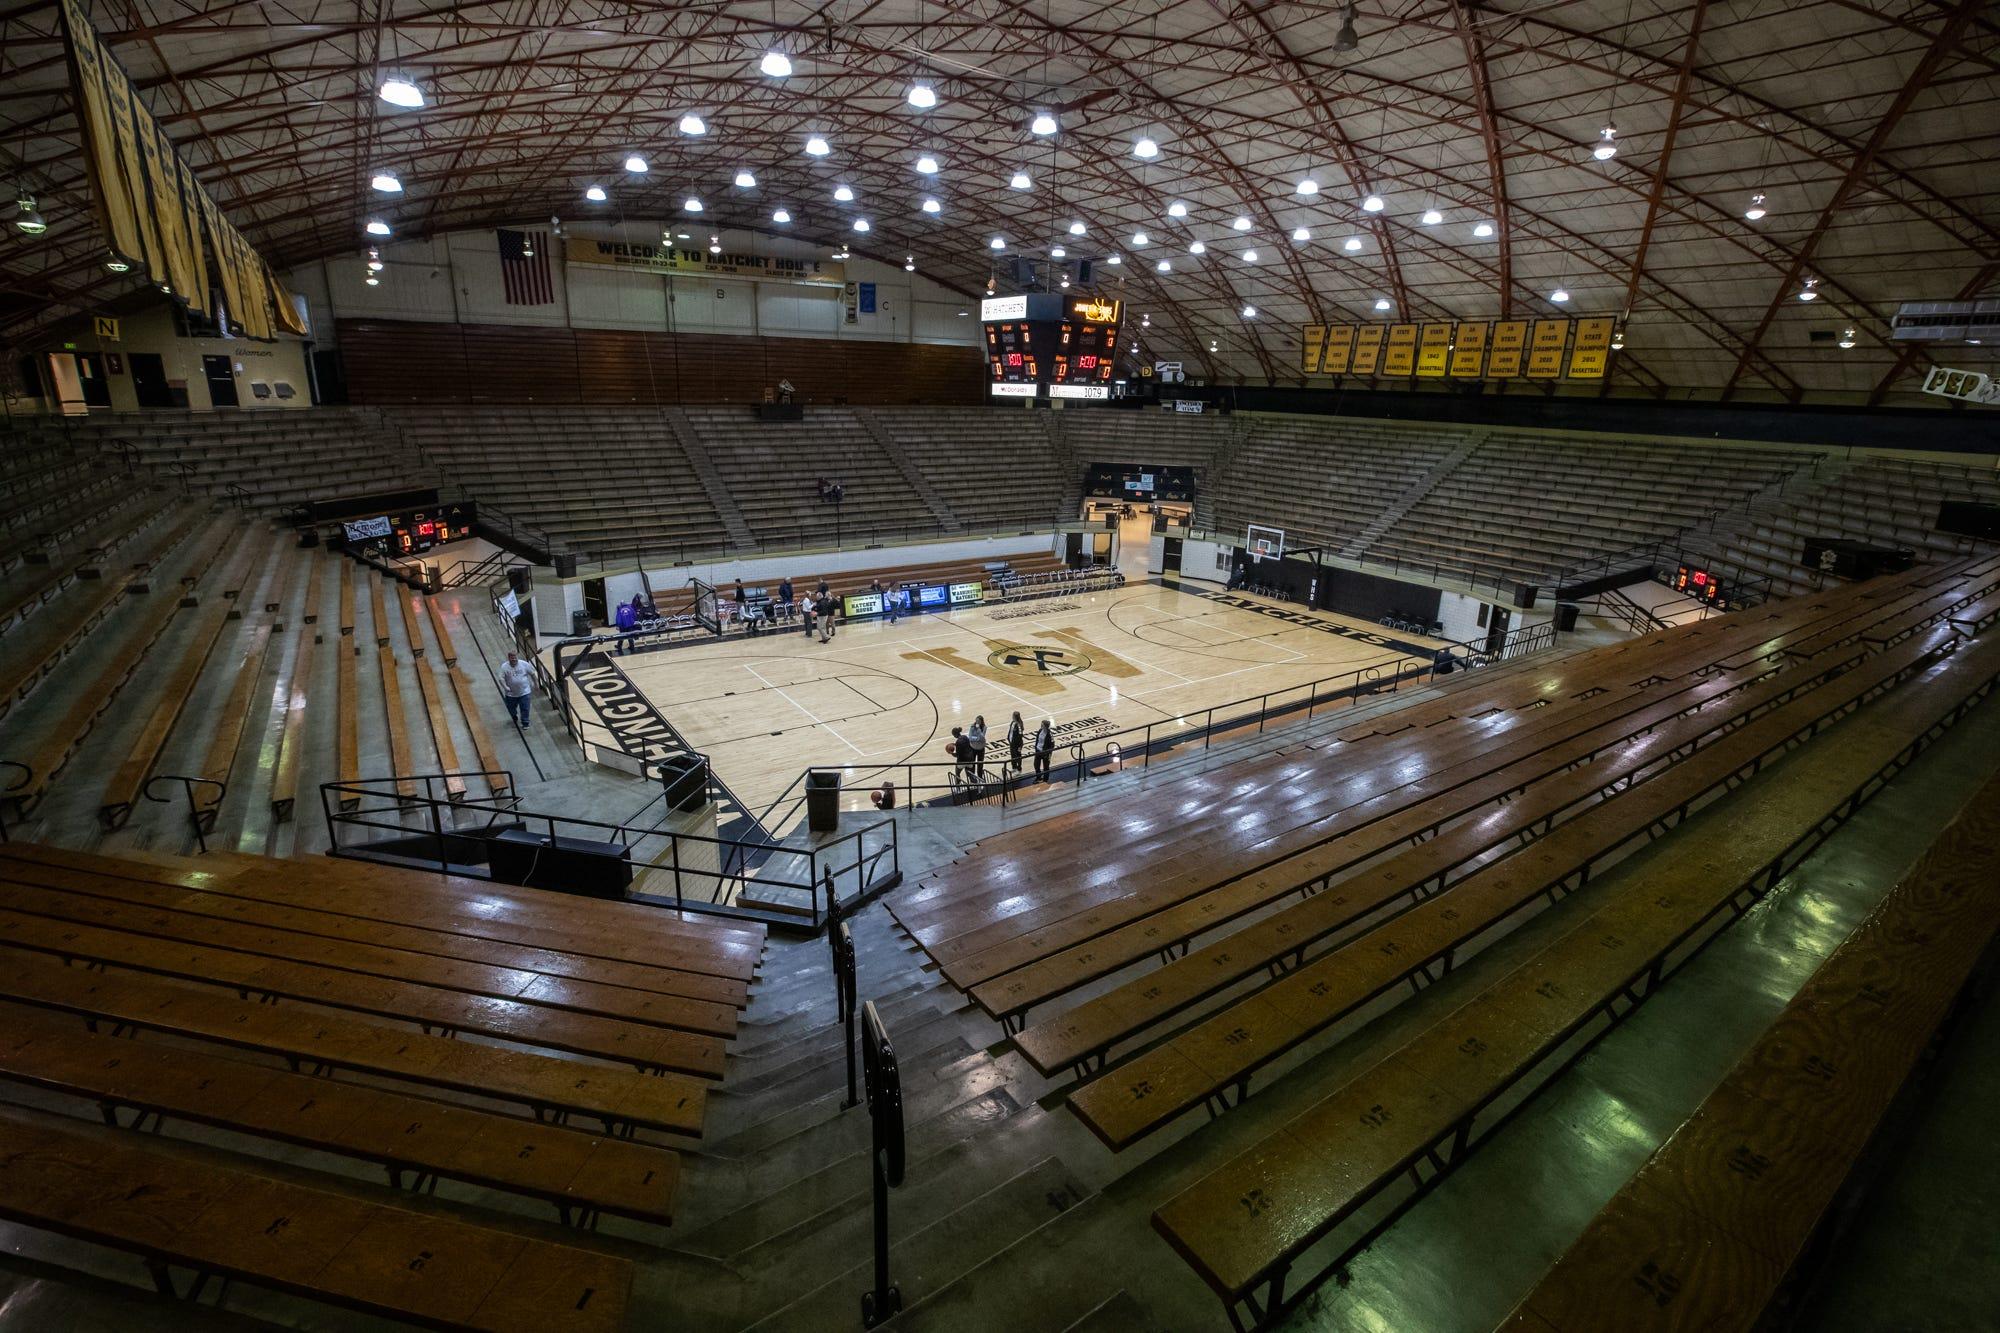 Inside Washington High School's Hatchet House on Thursday, Jan. 23, 2020. The gym holds 7090 people.